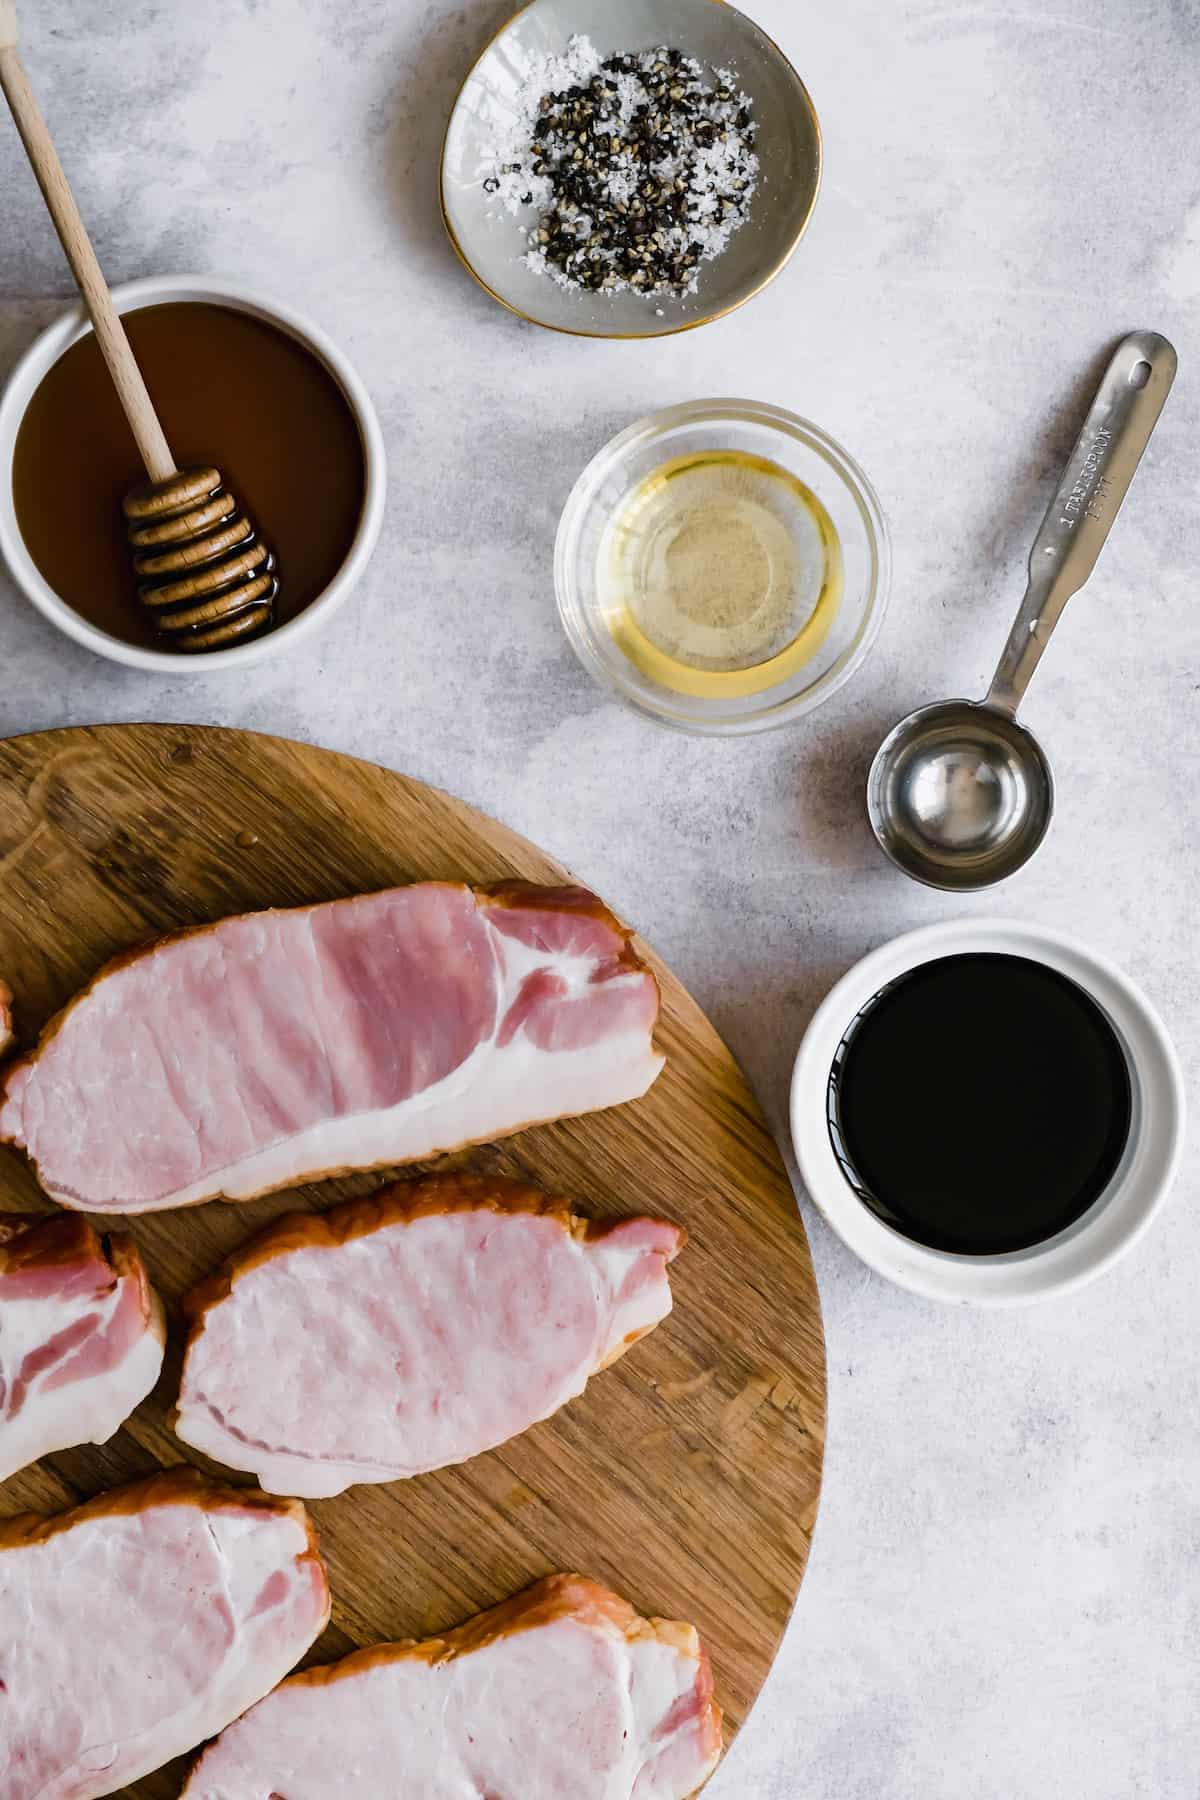 Ingredients for honey soy pork chops.